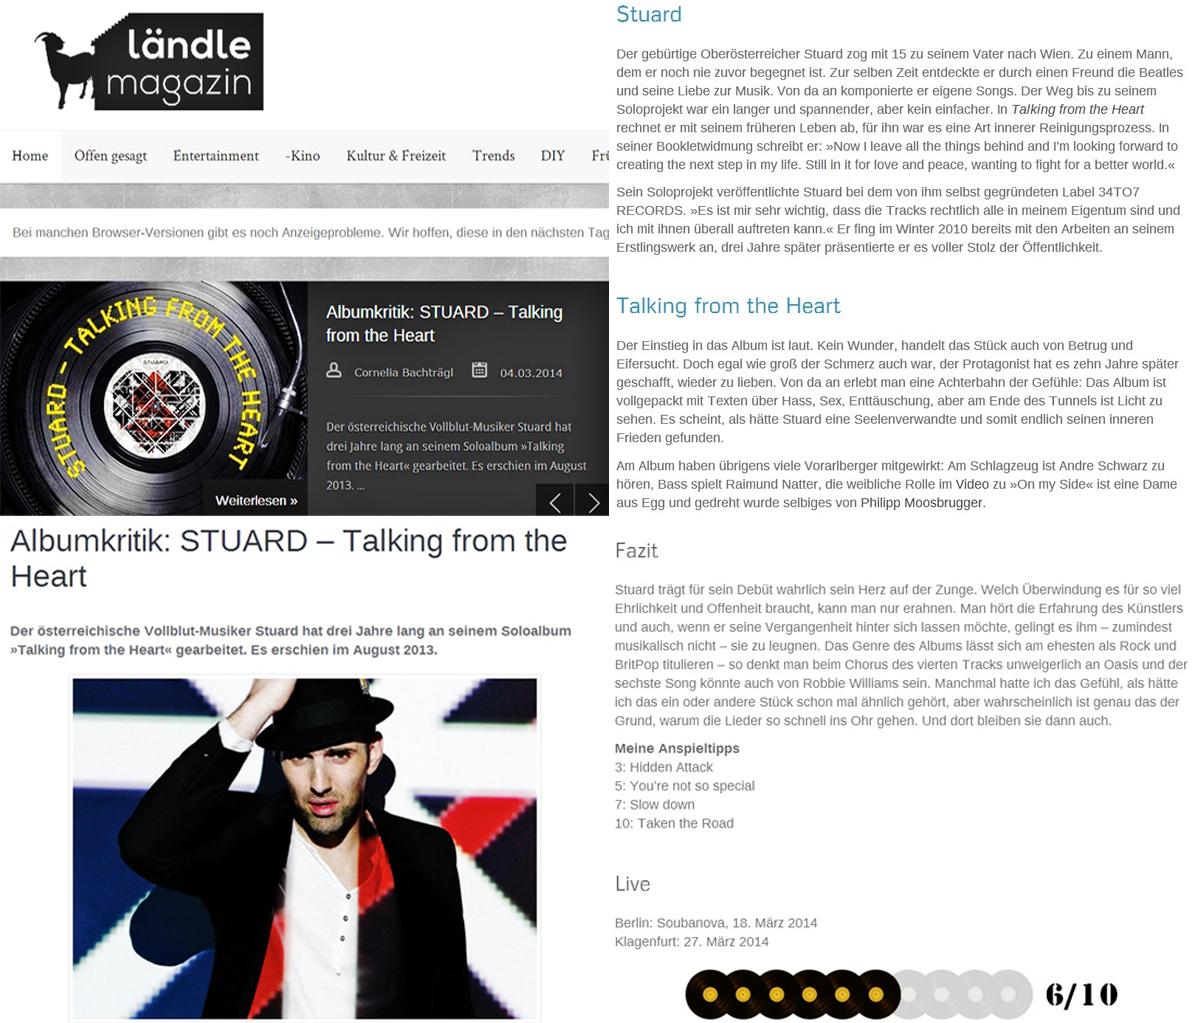 STU▲RD REVIEW LändleMag 05.03.2014